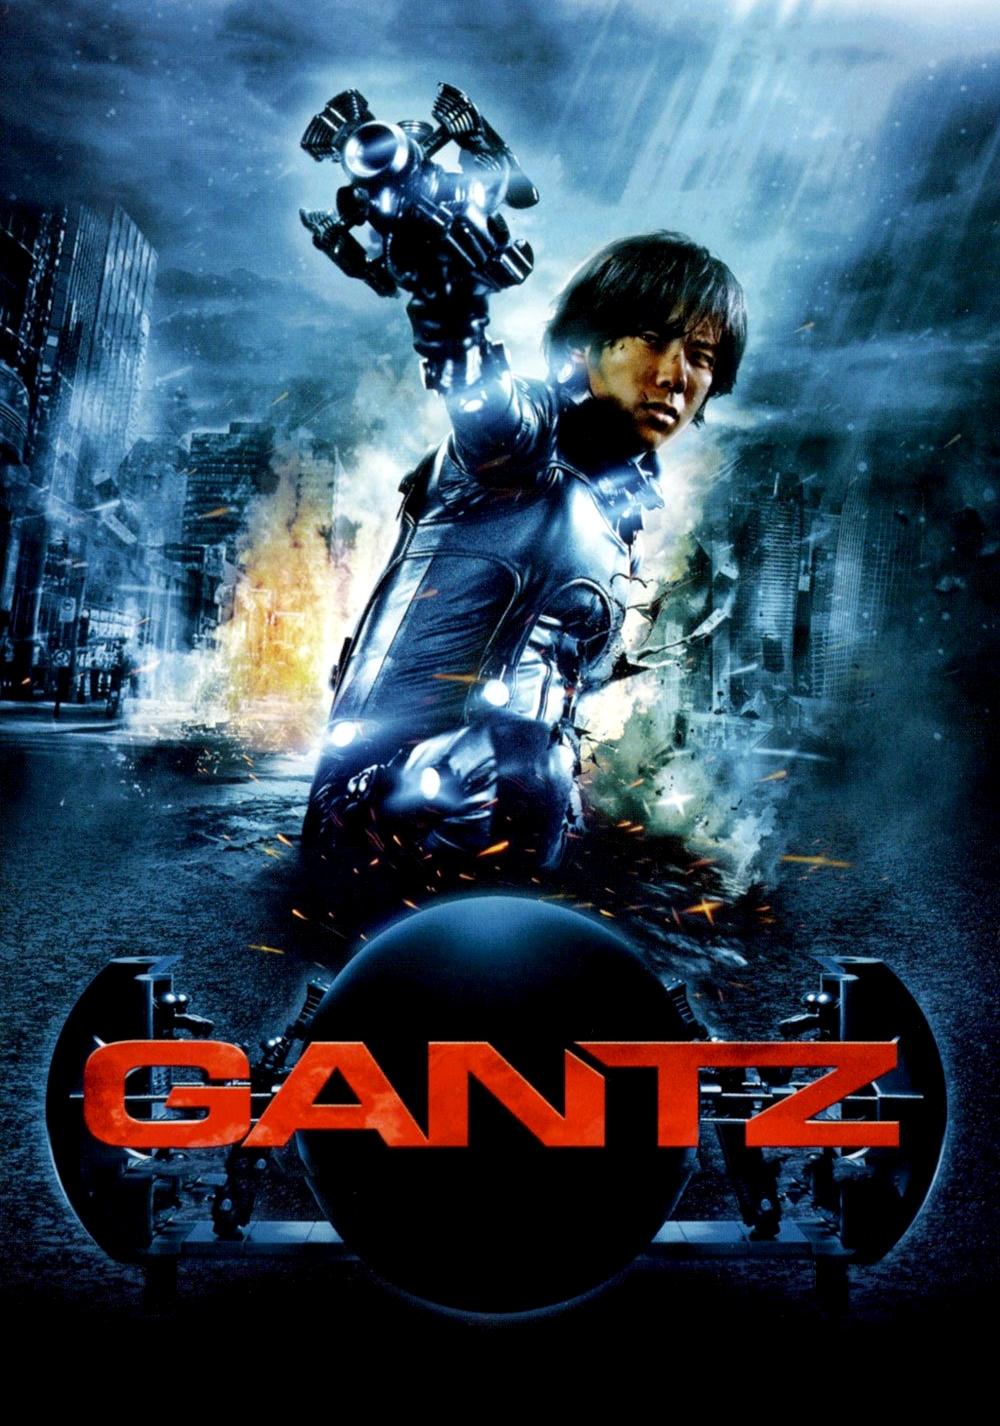 gantz anime blu ray download